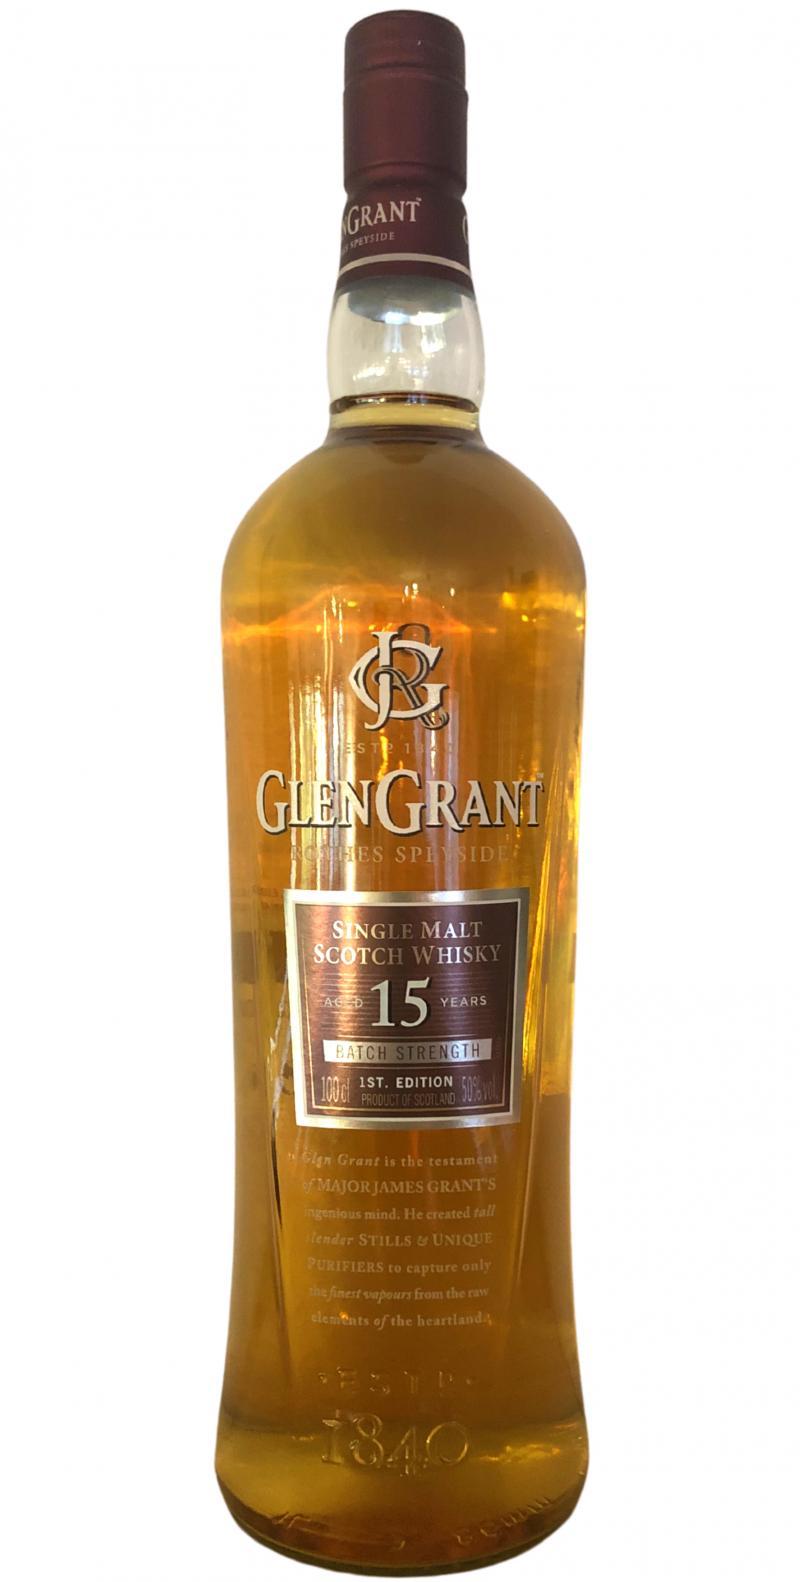 Glen Grant 15-year-old